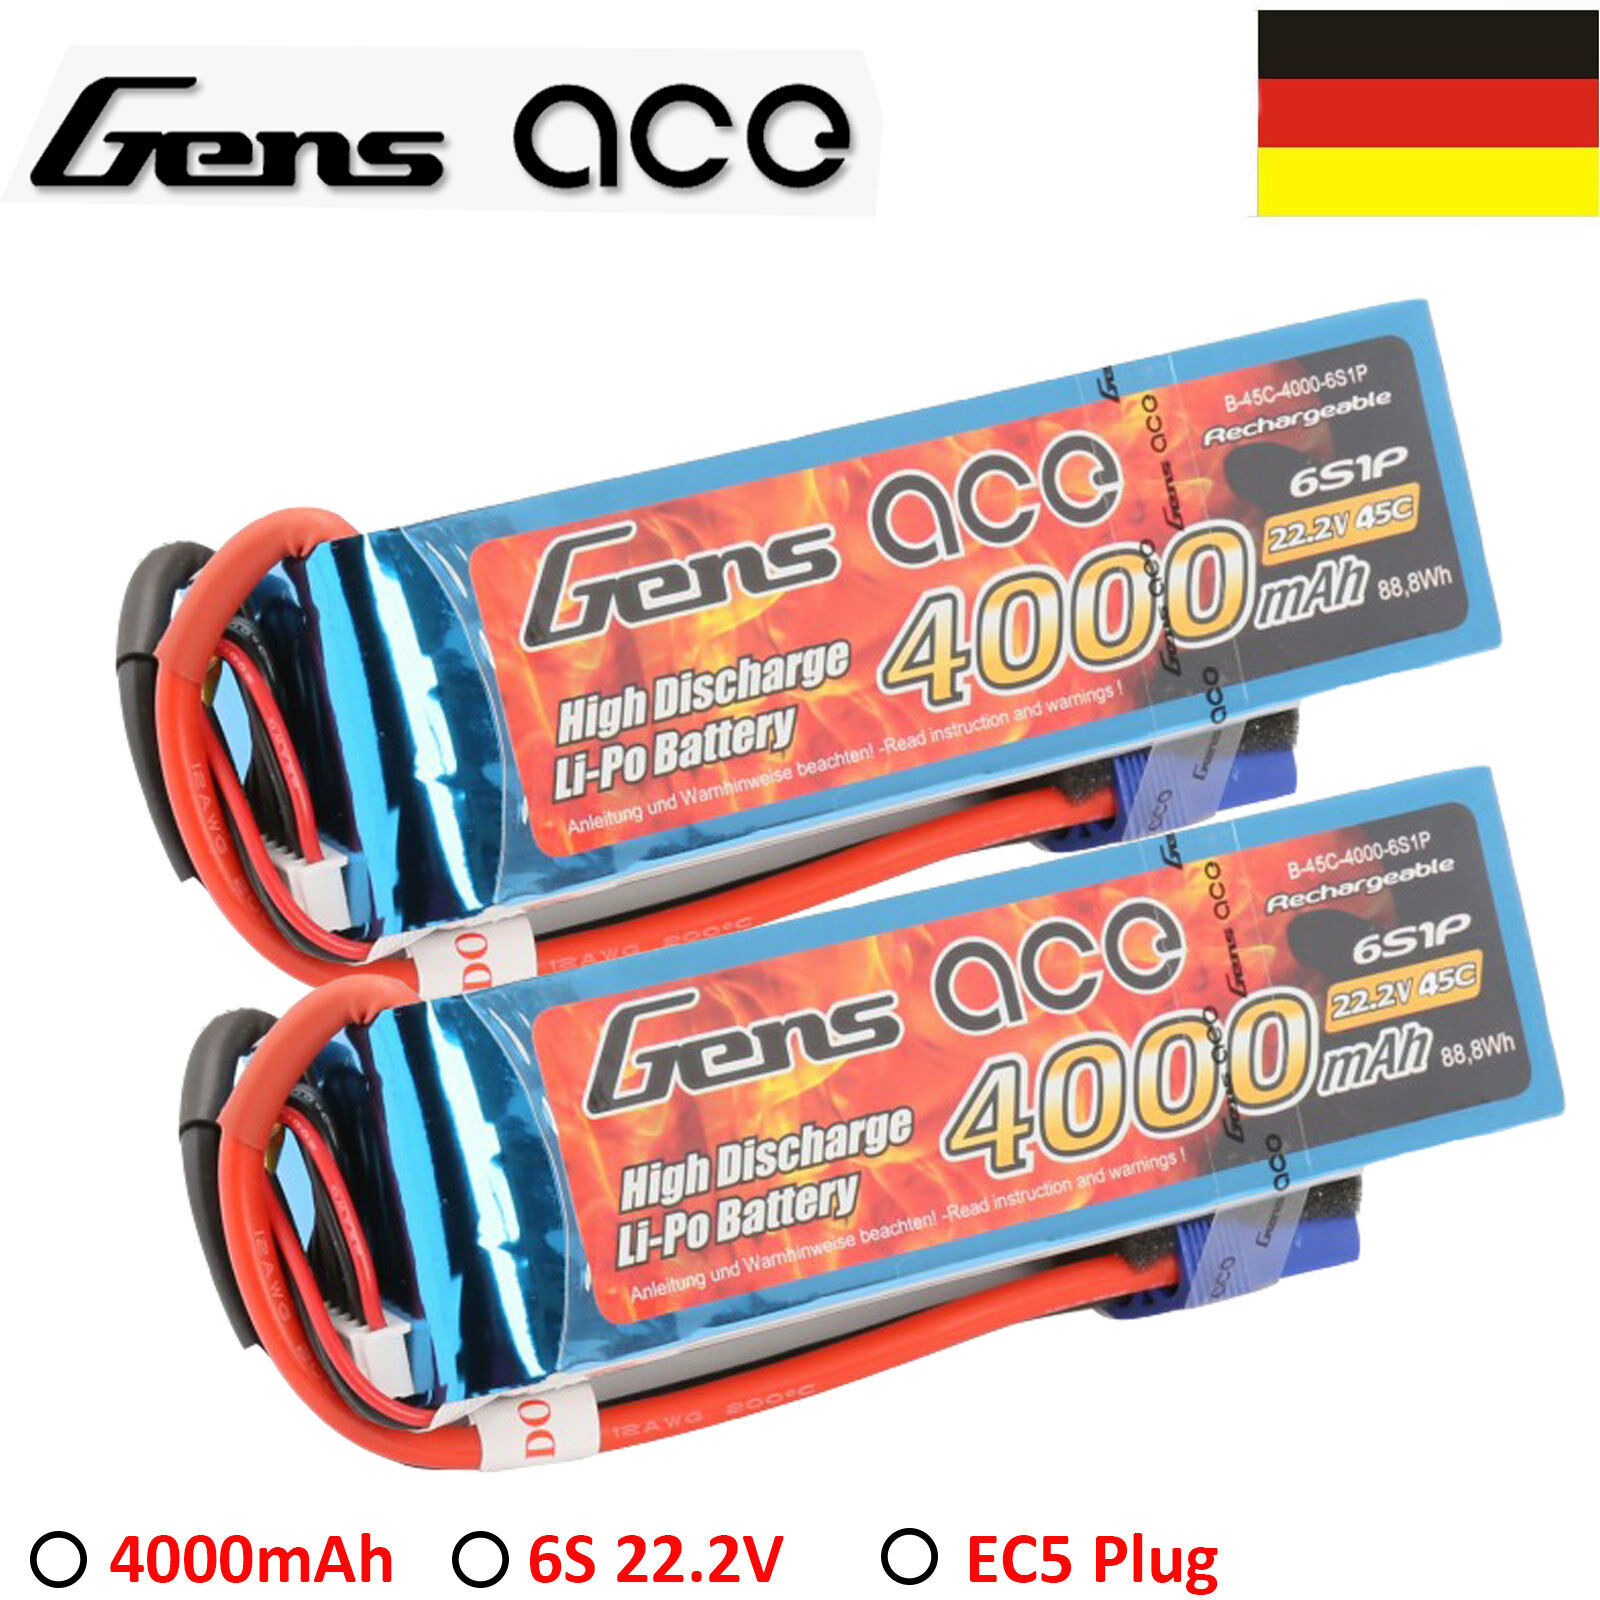 2x gens Ace 4000mah 6s 45c 22.2v Lipo batería RC batería para Goblin 500 570 Heli